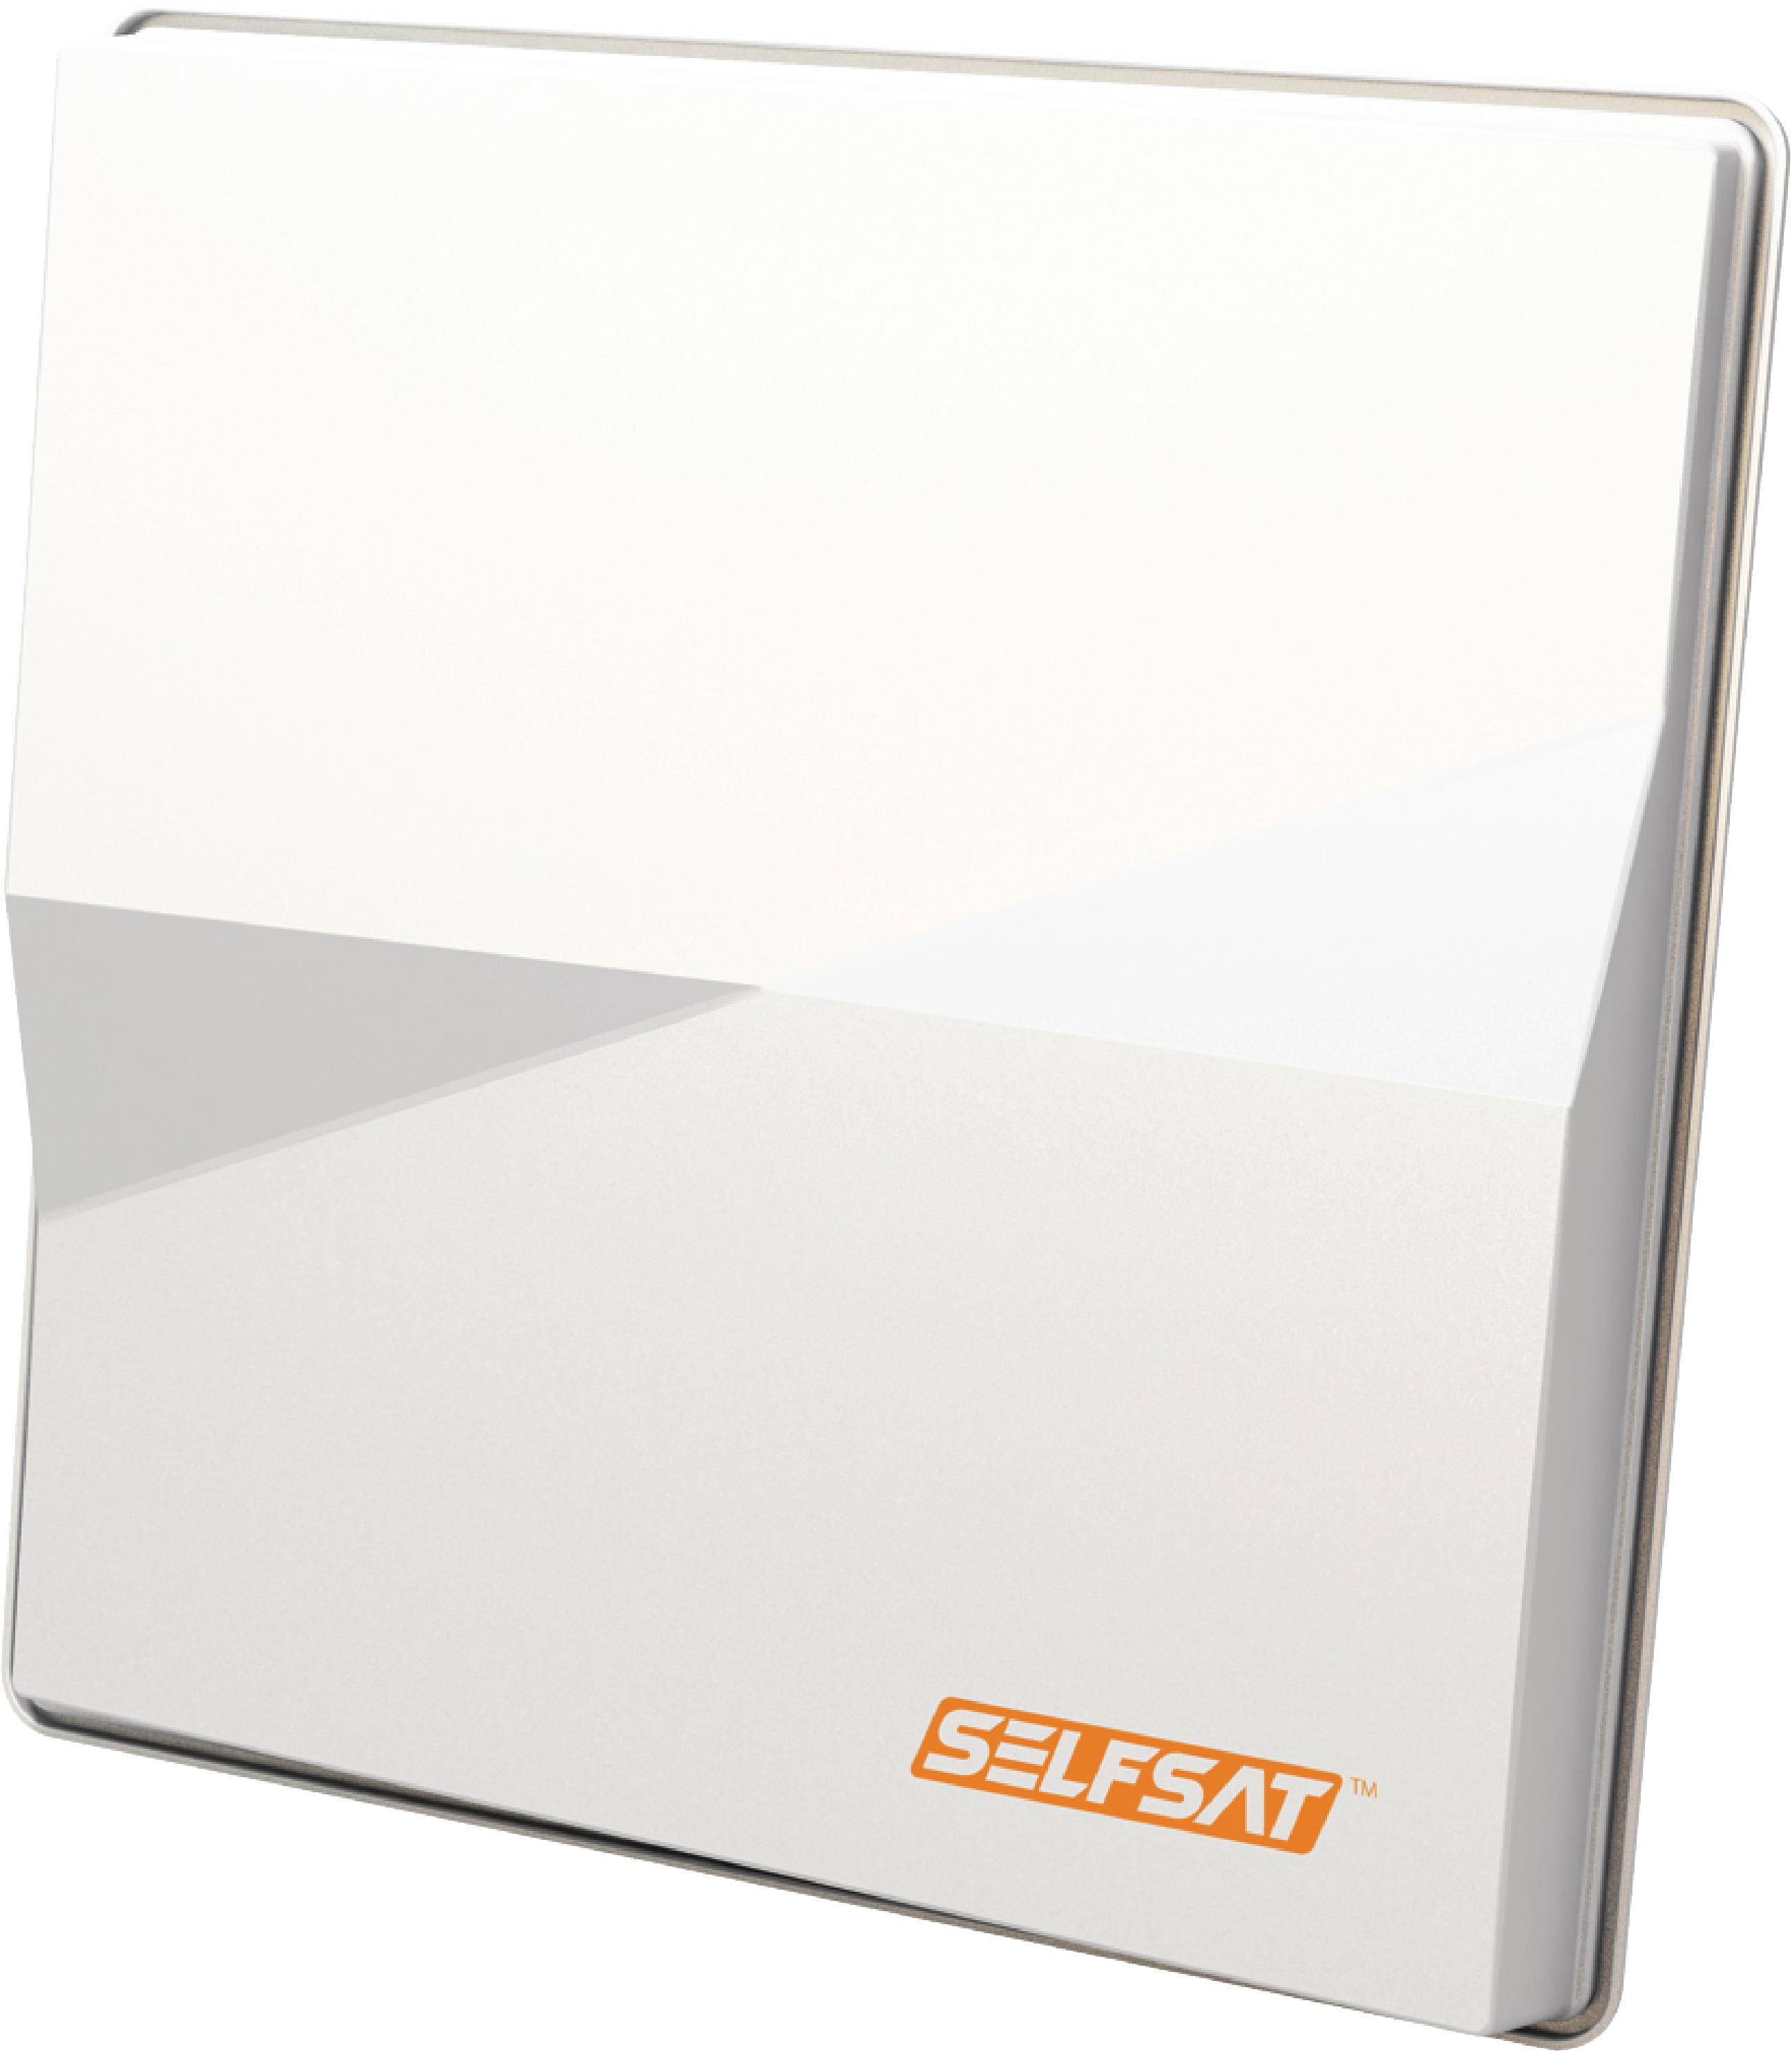 H50M4 FLAT SATELLITE DISH QUAD LNB WHITE